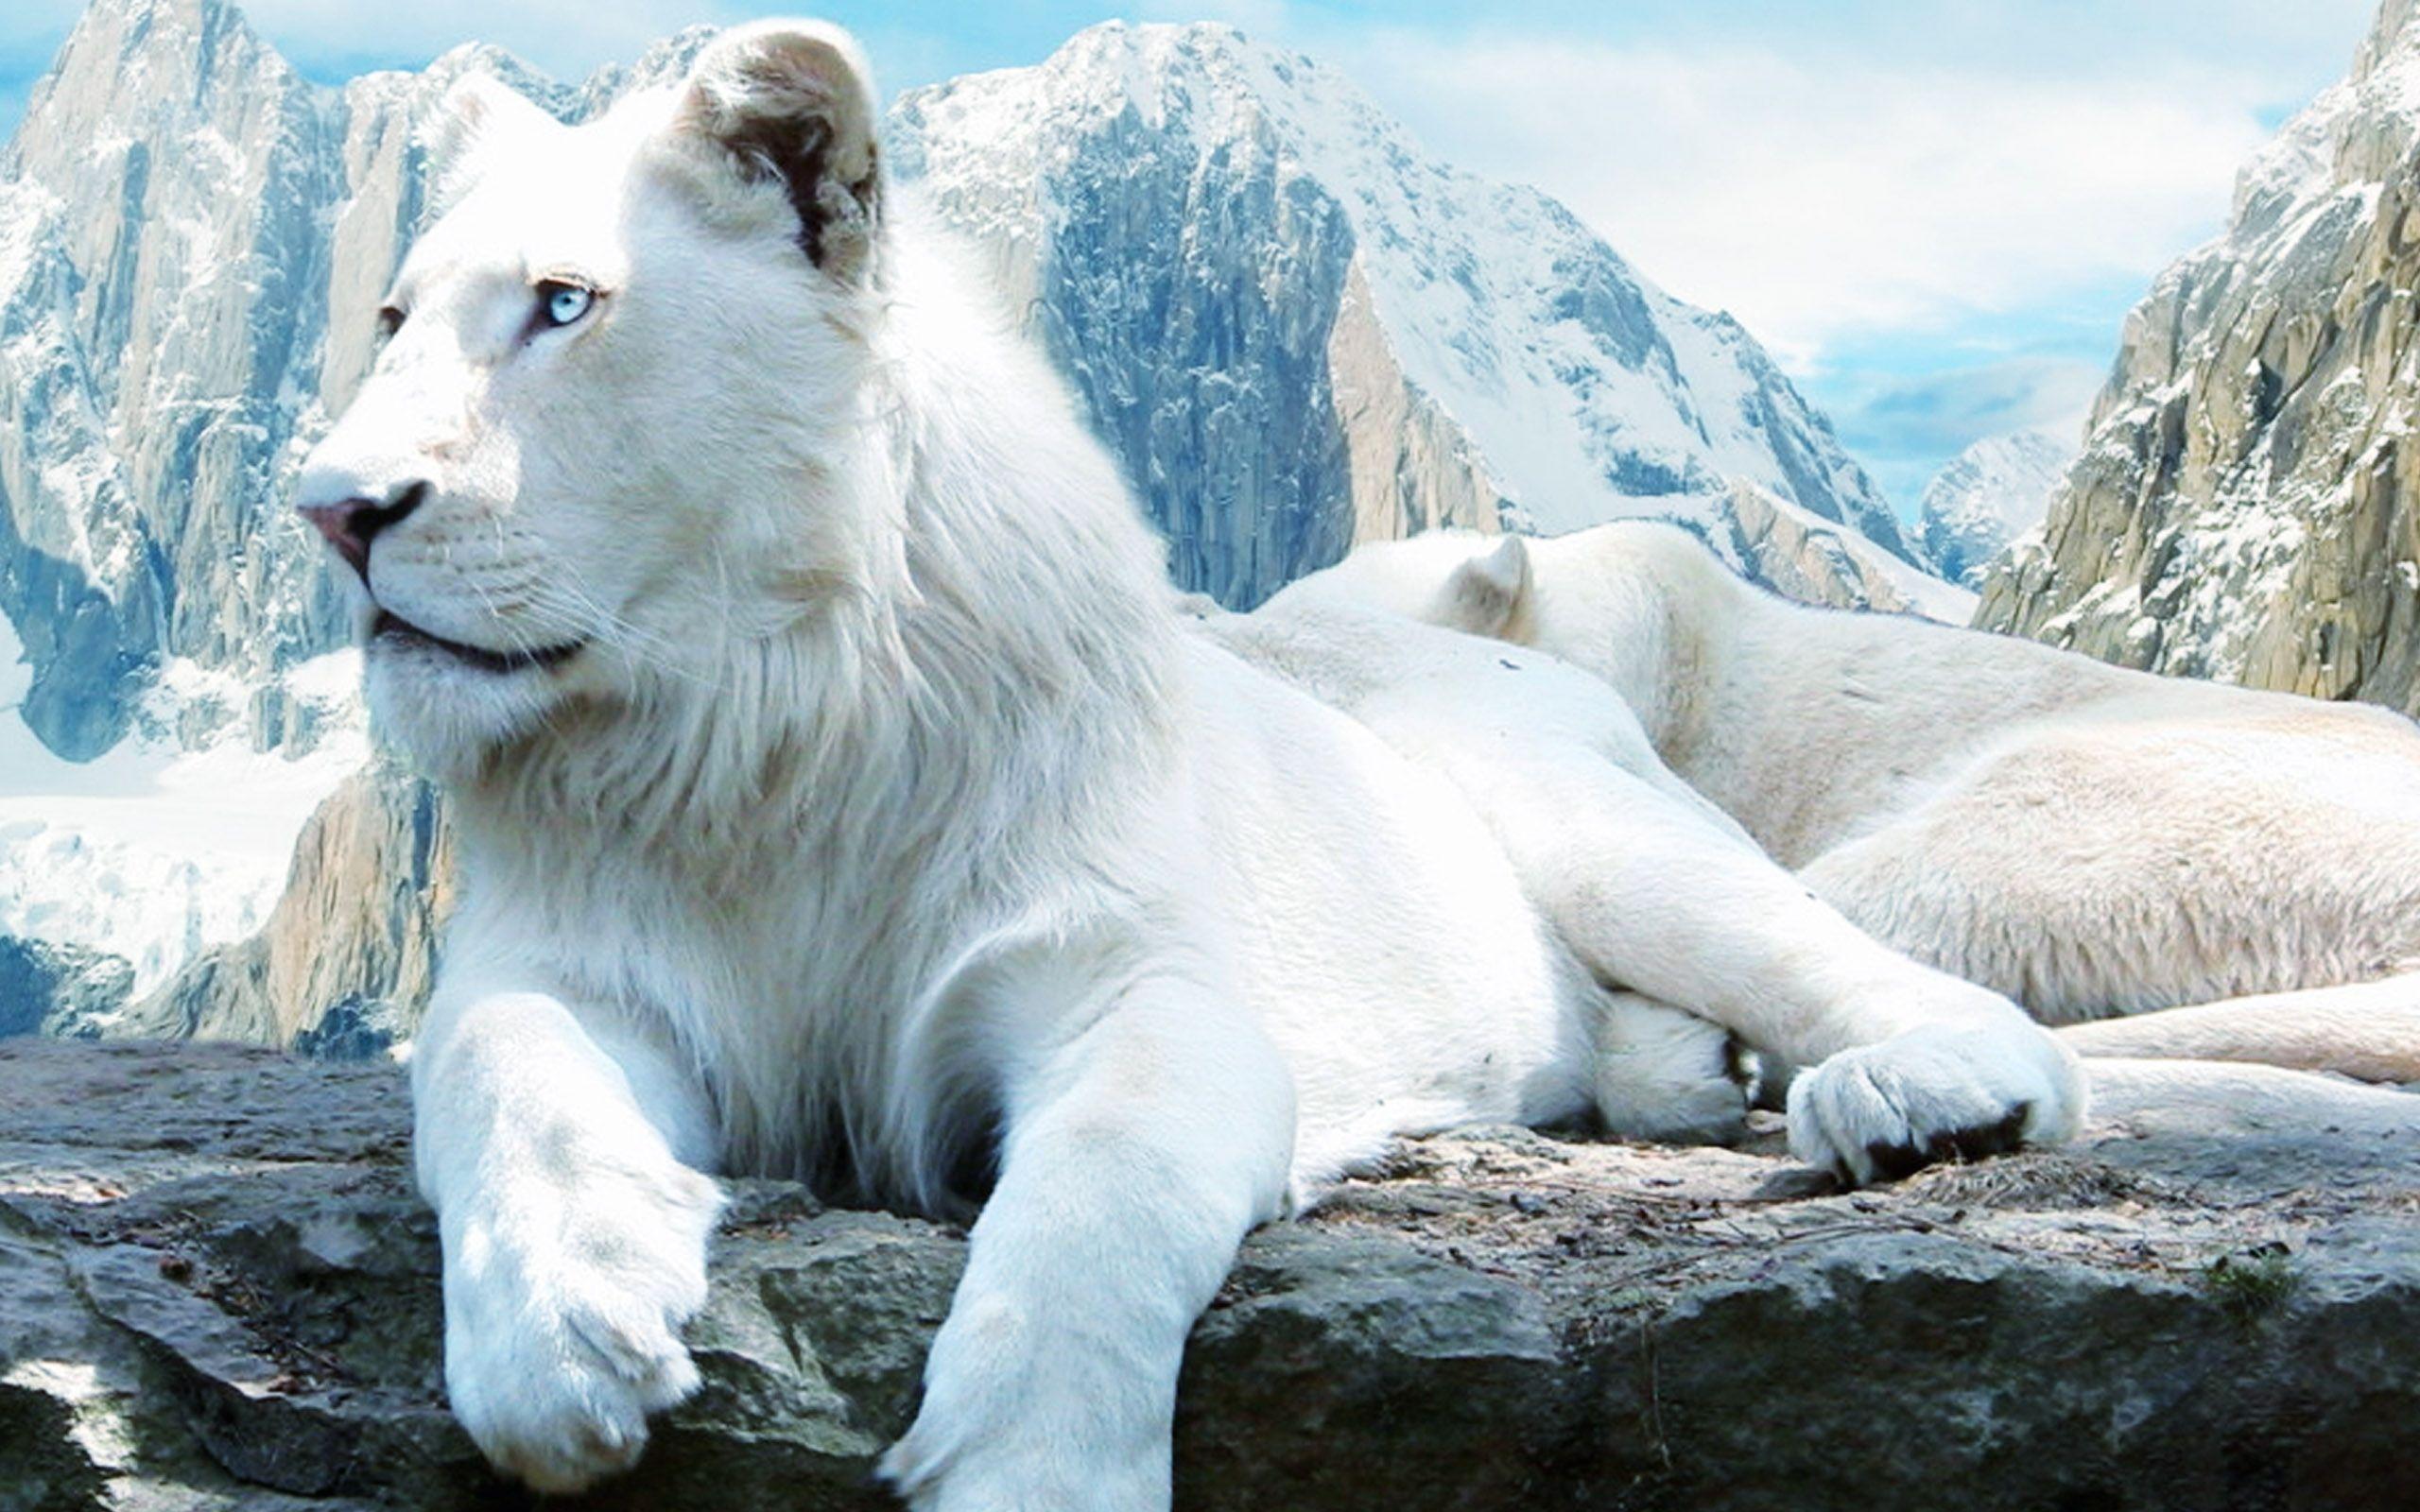 Hd wallpaper lion - White Lion Pictures White Lions Hd Wallpapers Hd Wallpapers Inn